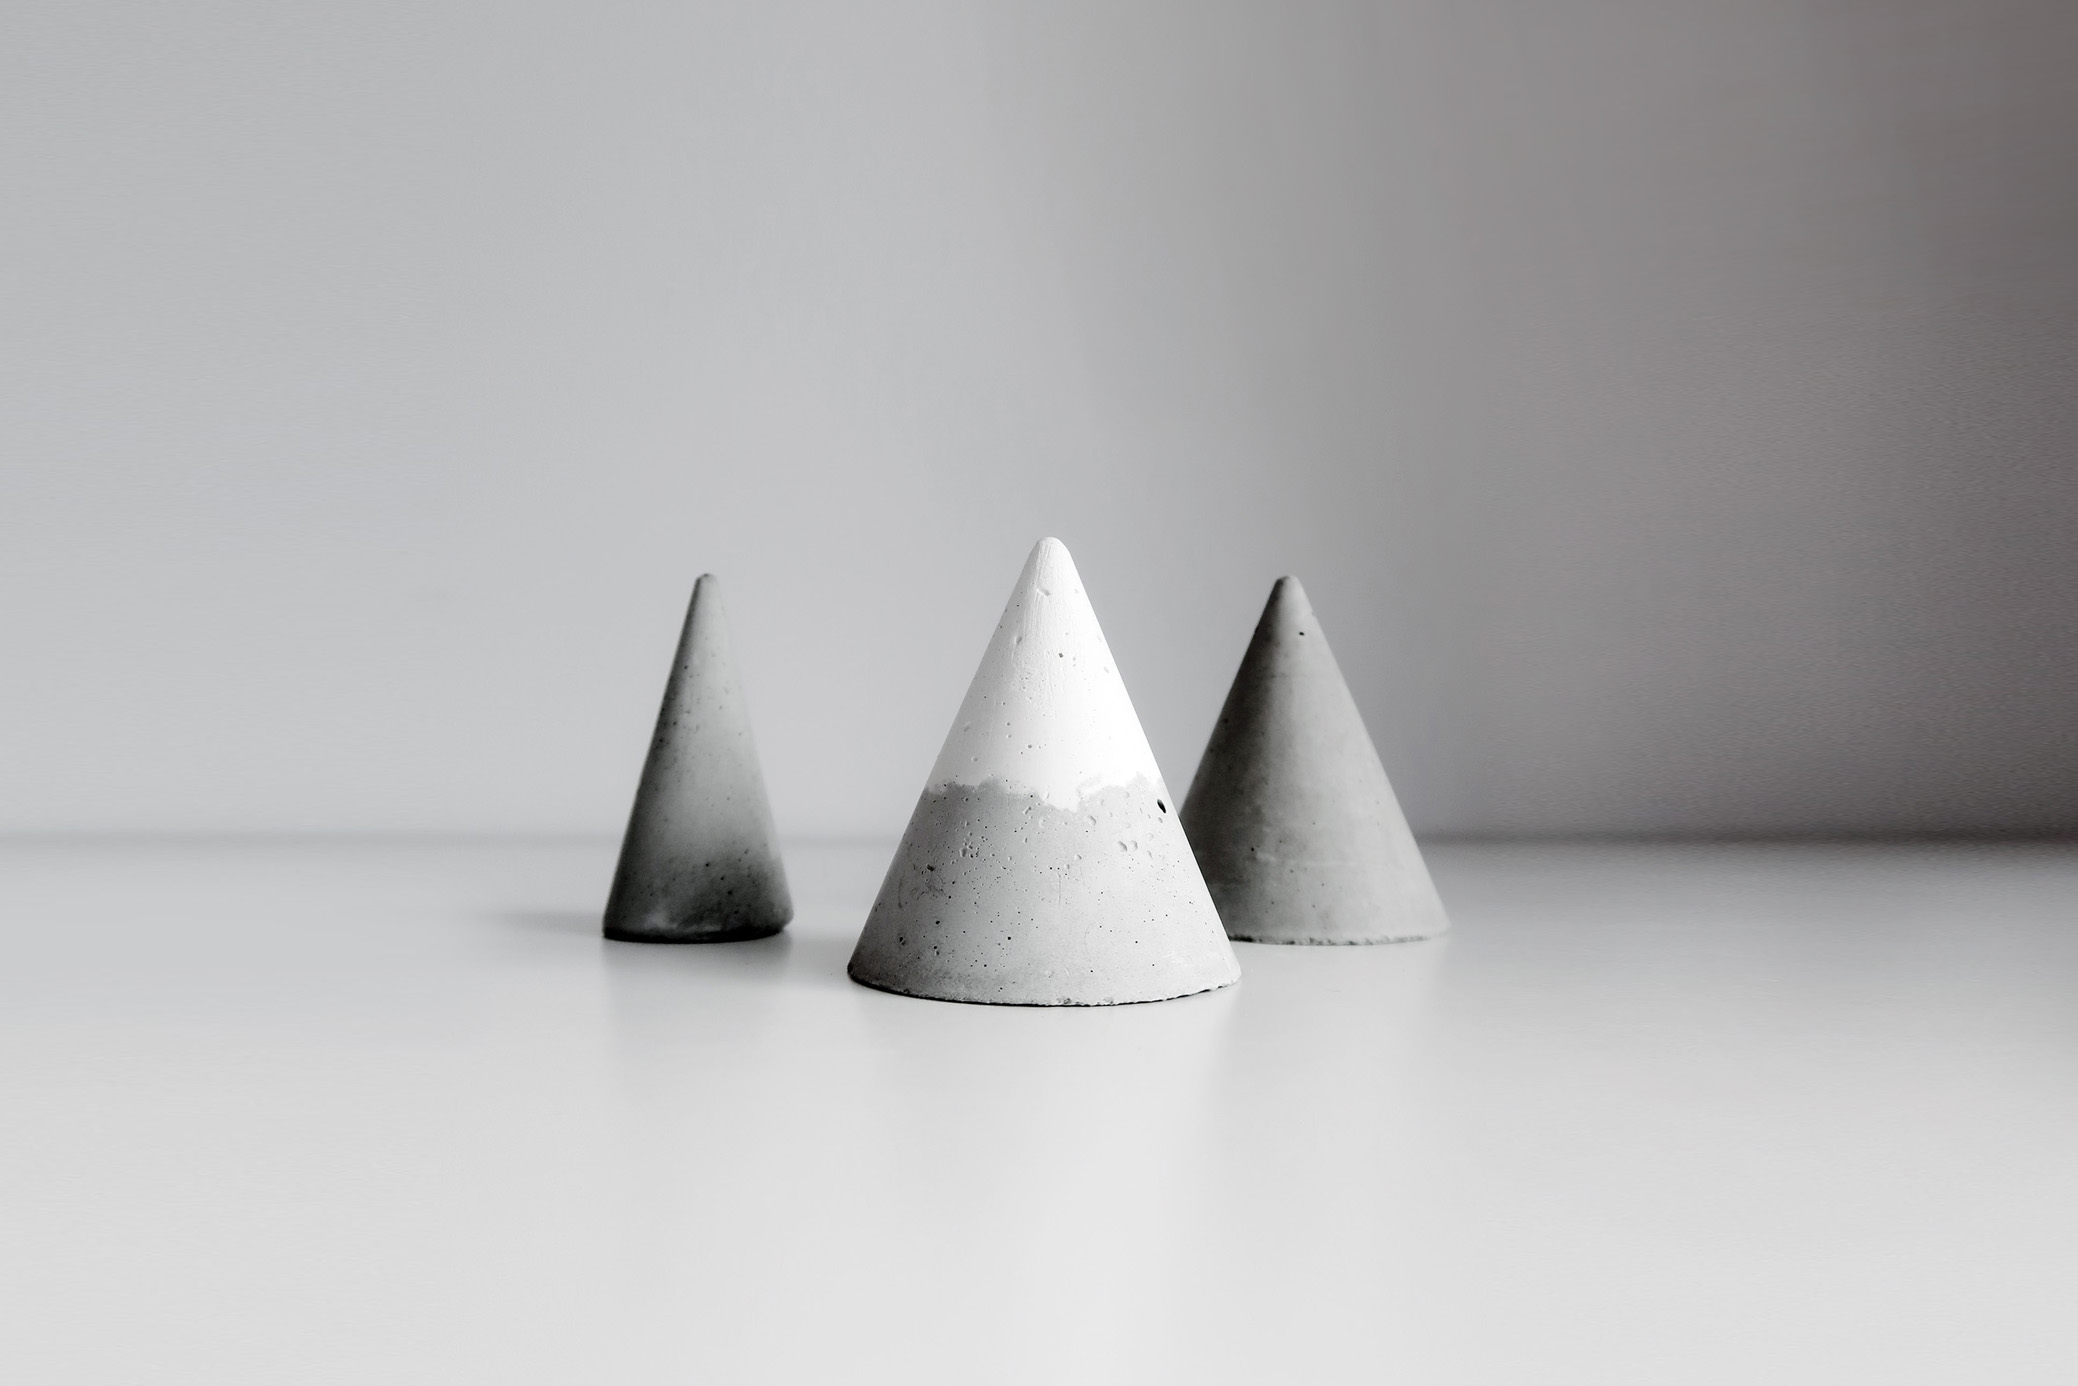 HILL SCENERY 小山景雙色錐形水泥擴香石戒指座 3 入組